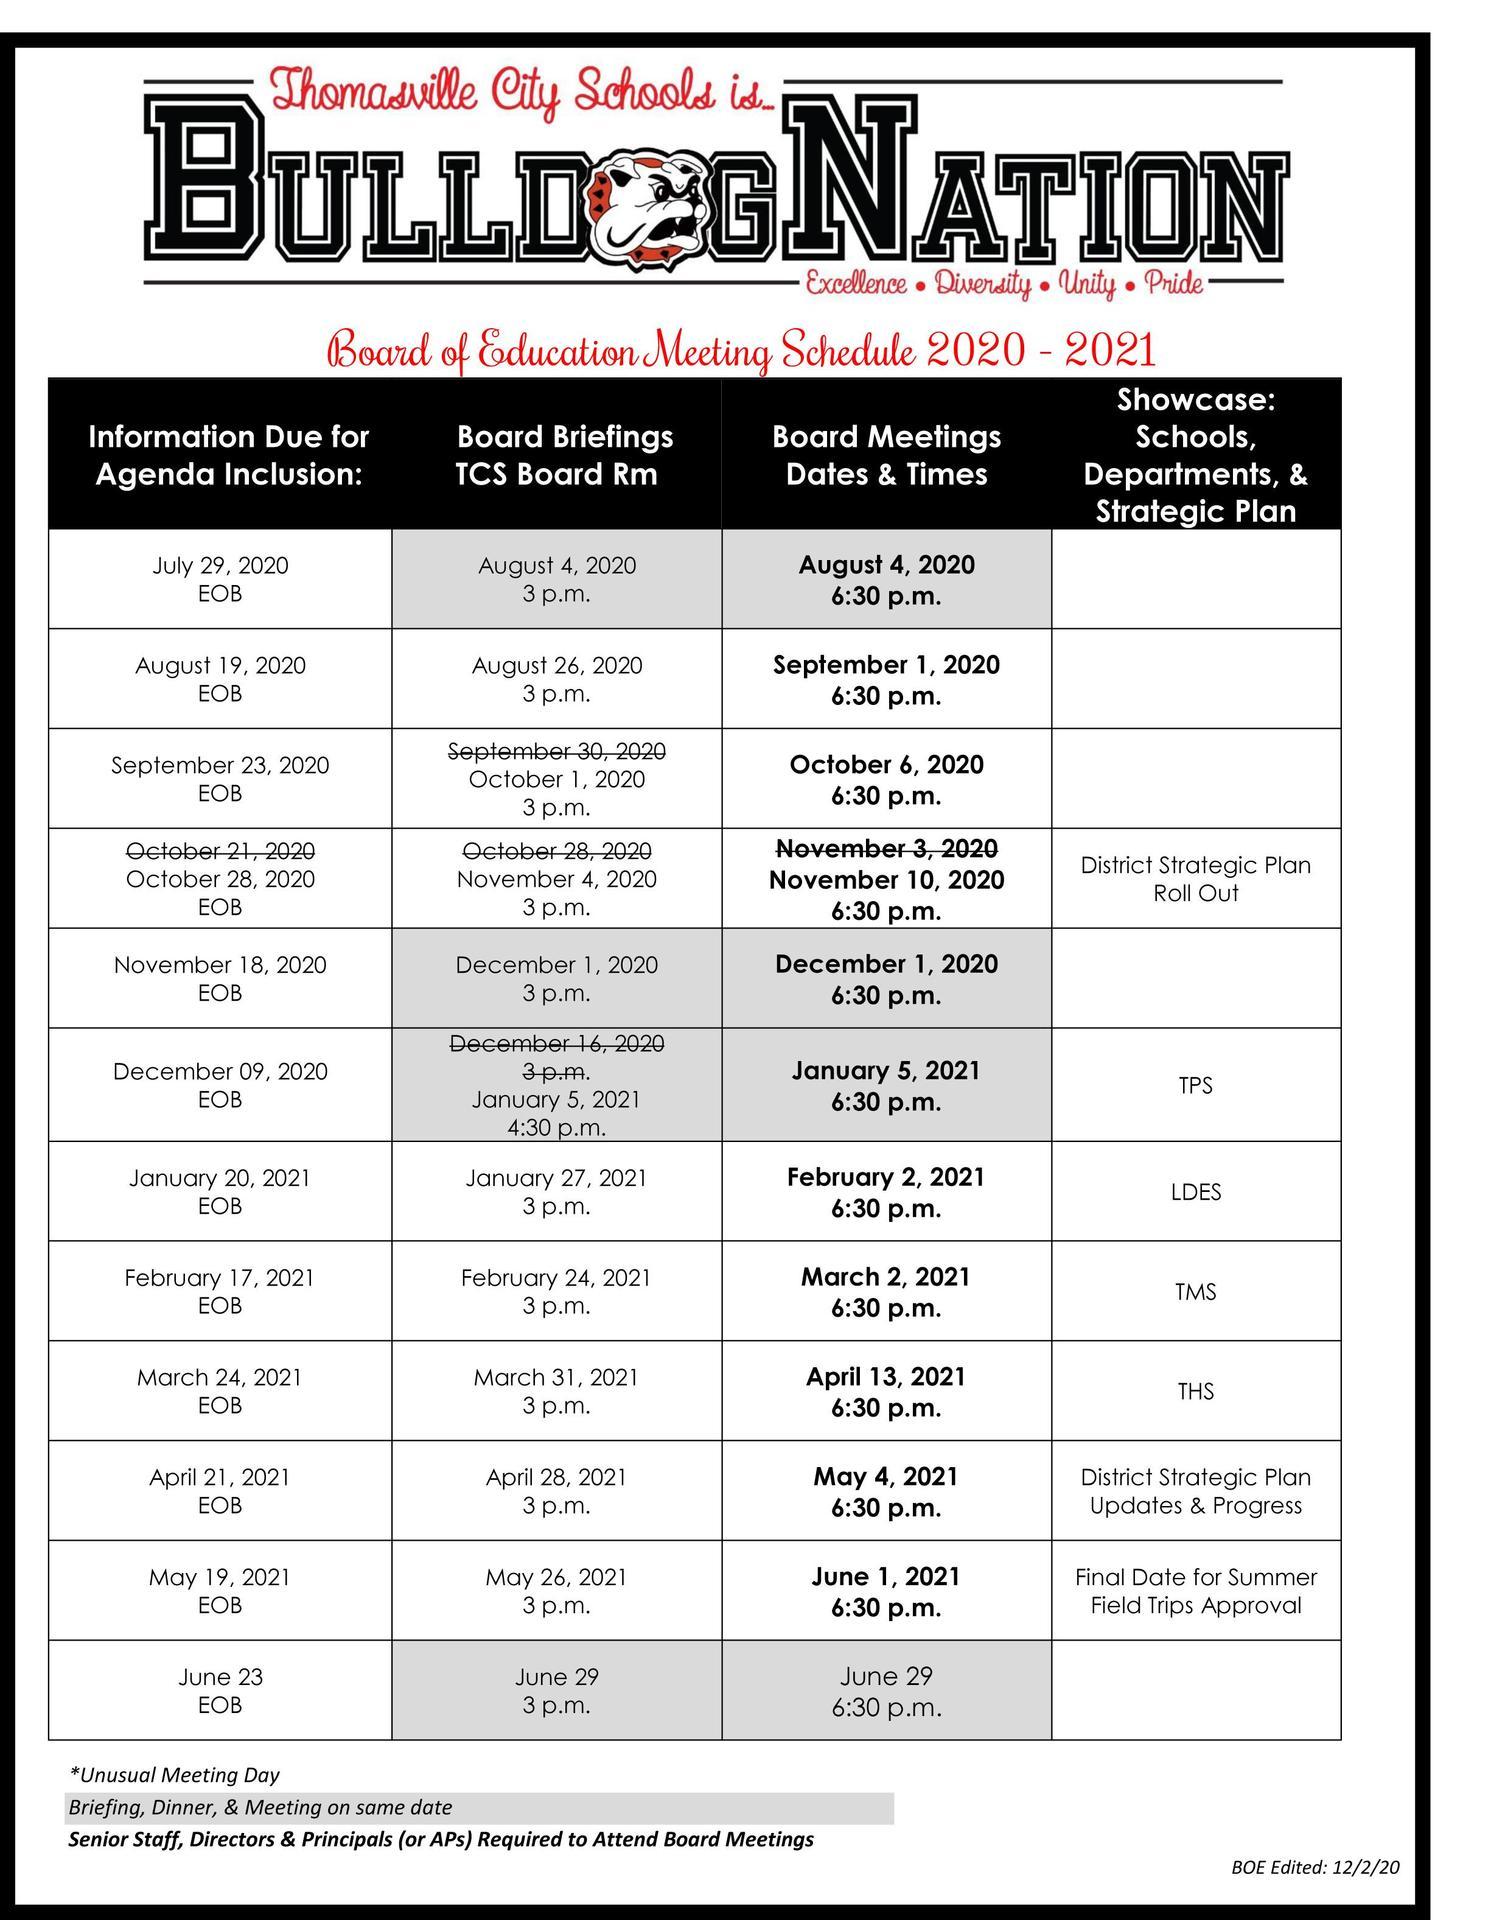 Board of Education Meeting Schedule